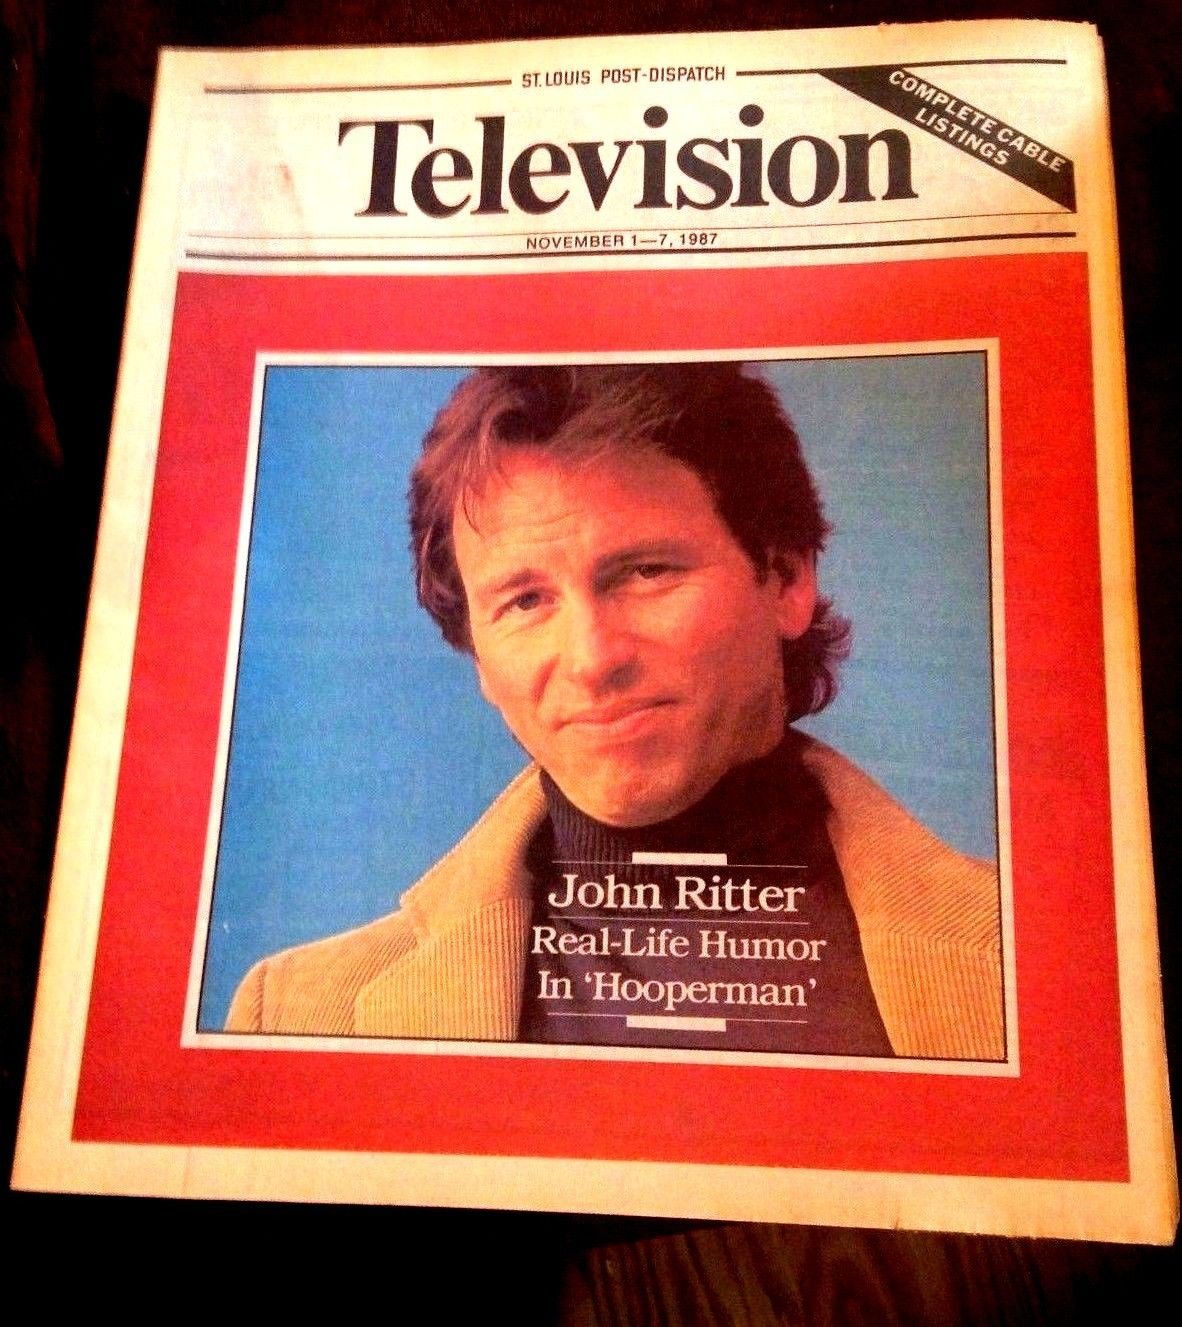 TV_GUIDE_JOHN_RITTER_IN_COMEDY_11-1-87_ST_LOUIS_NEWSPAPER_RARE_NM